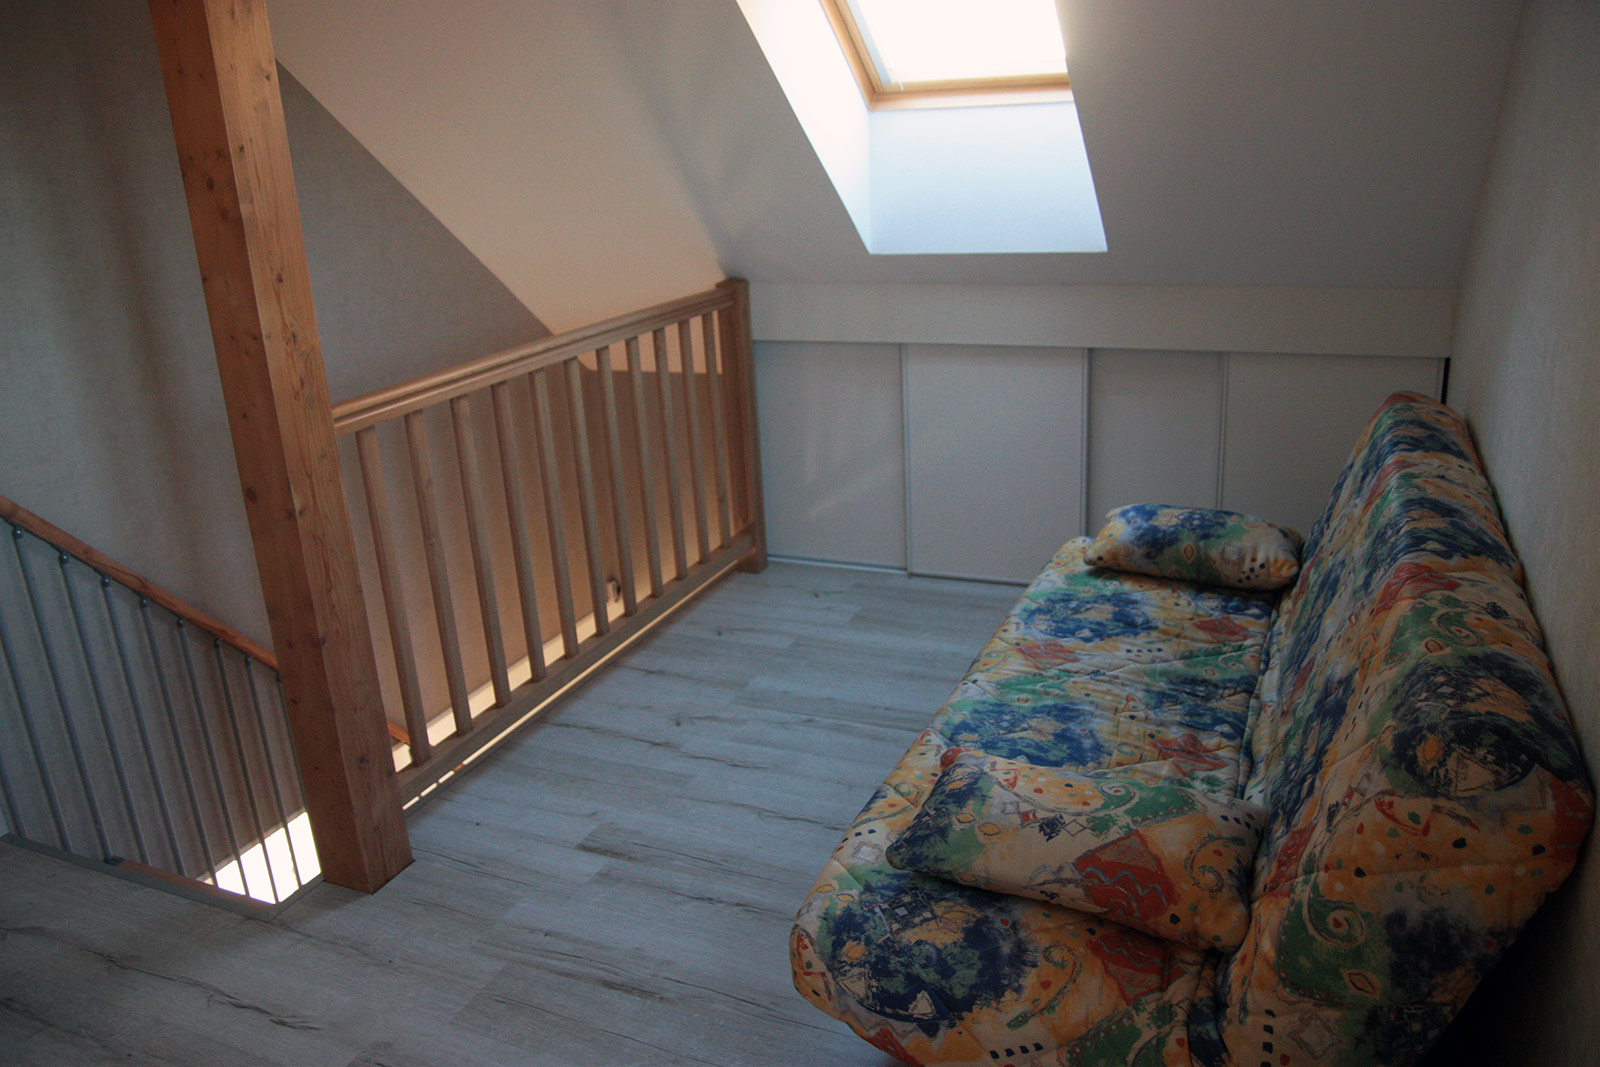 Accommodation of Mr. Heitzmann